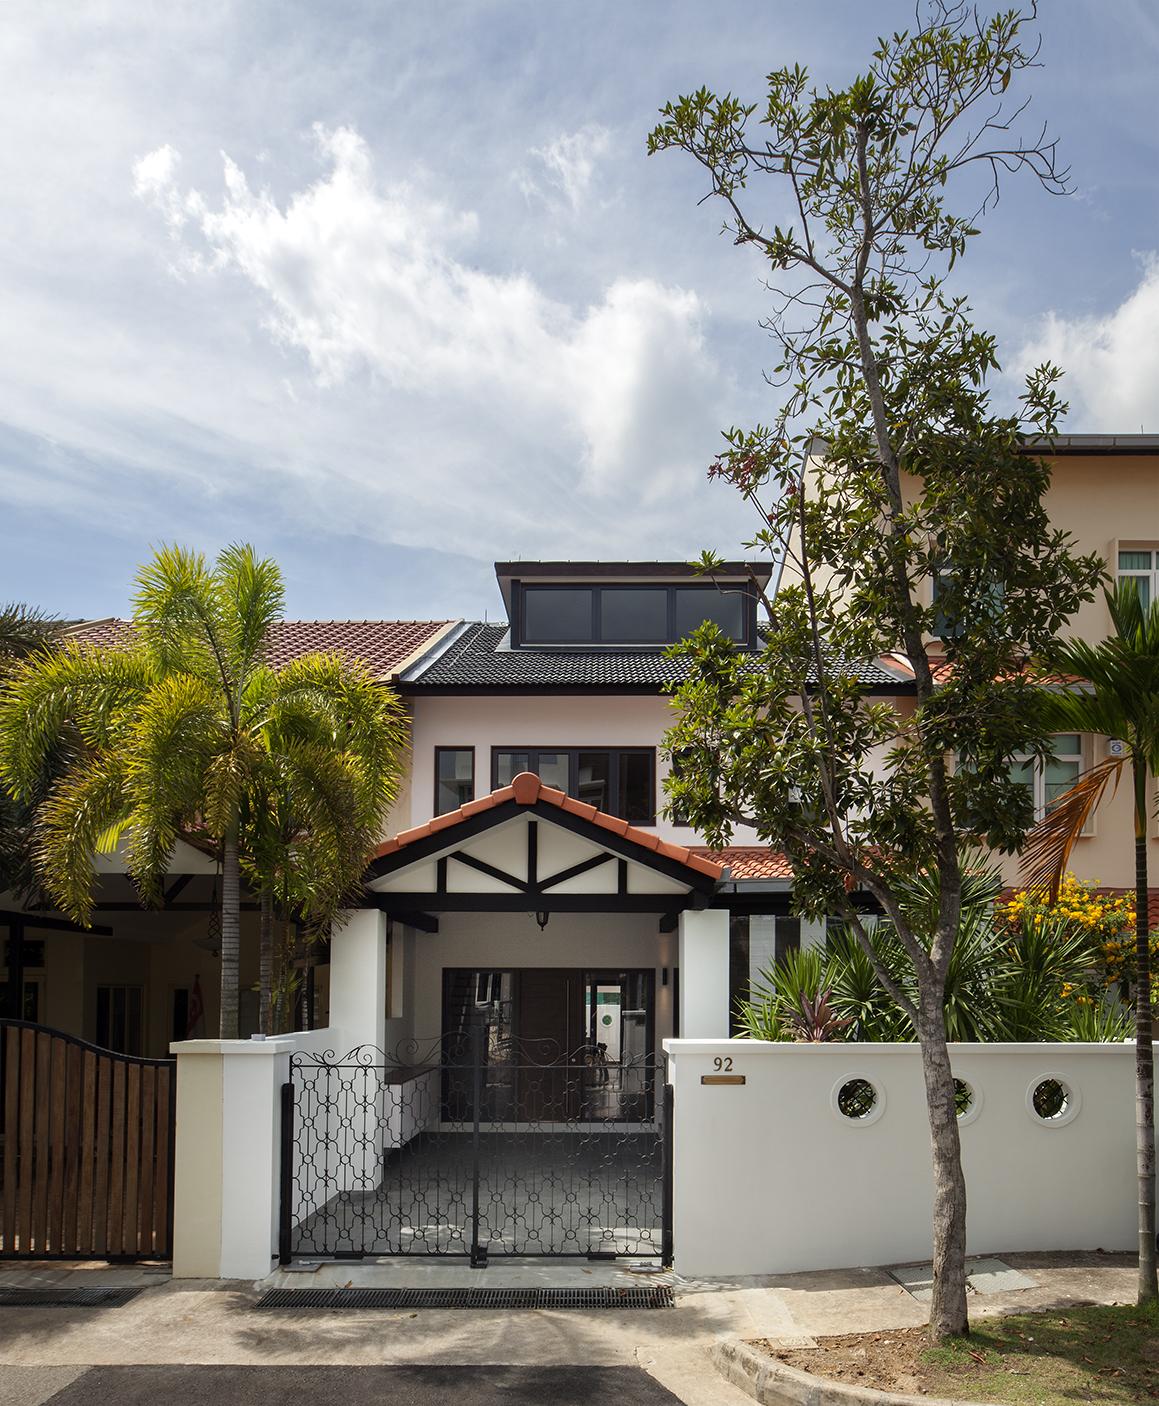 Main facade of Terrace House at Joo Chiat